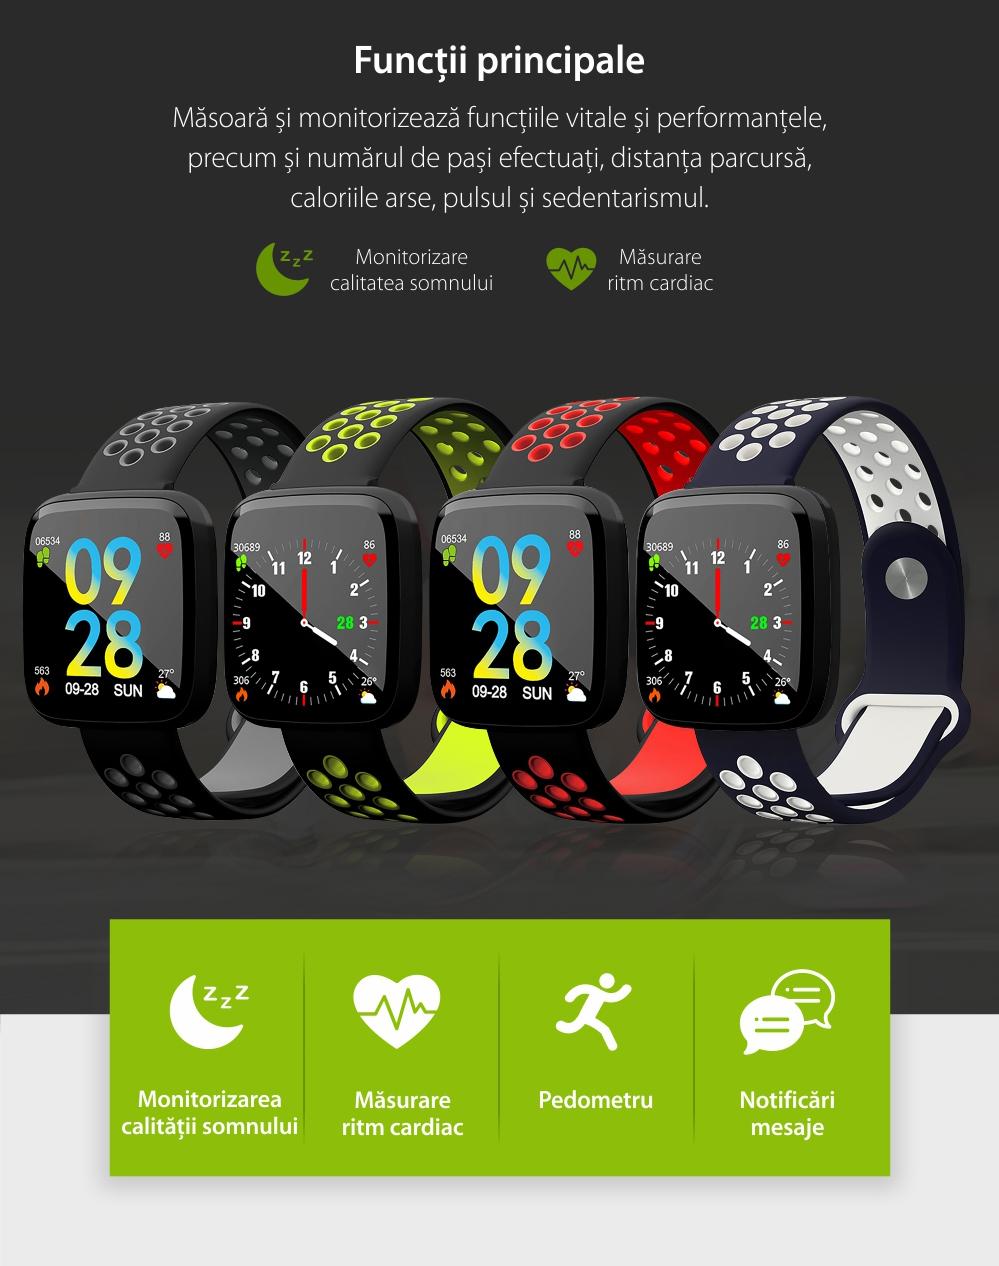 Bratara fitness inteligenta TKY-F15 cu functie de monitorizare ritm cardiac, Tensiune arteriala, Nivel oxigen, Monitorizare somn, Notificari Apel/ SMS, Incarcare magnetica, Negru-Gri